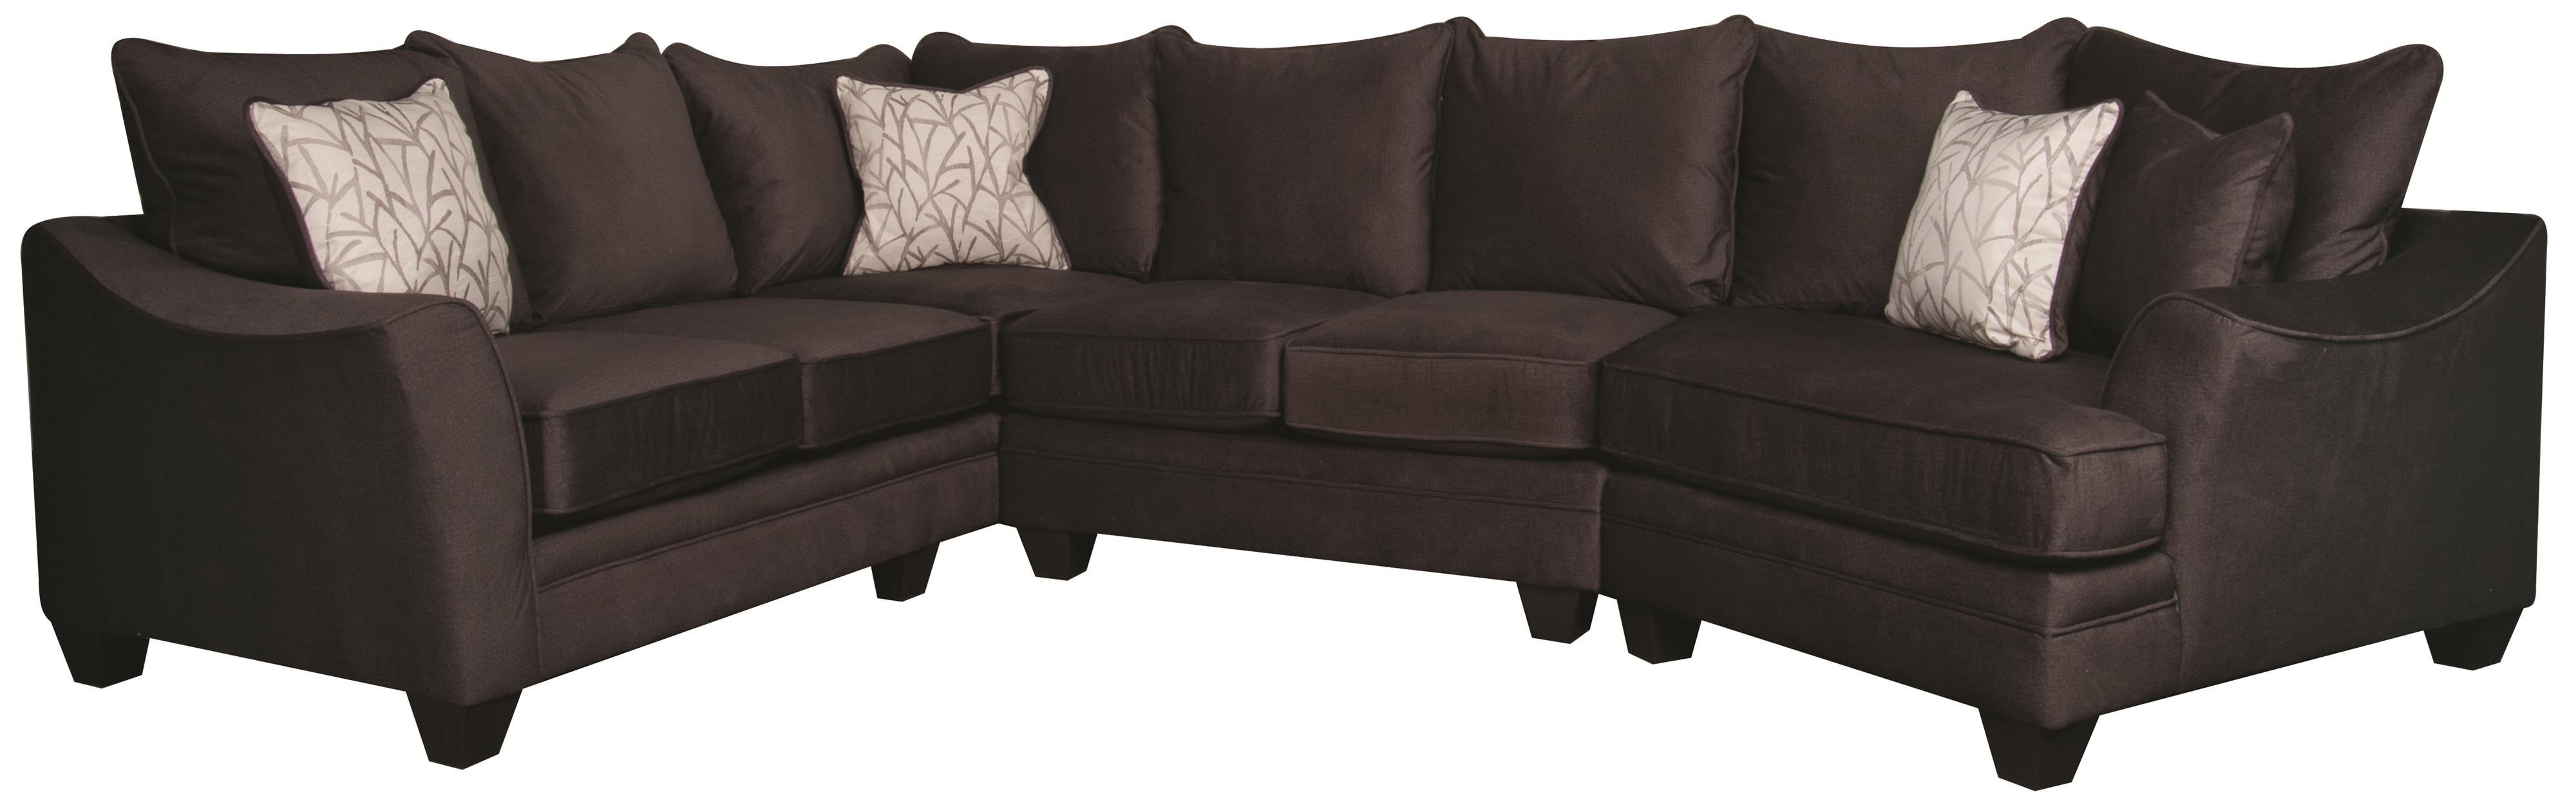 Rachel  Rachel Sectional Sofa by Peak Living at Morris Home